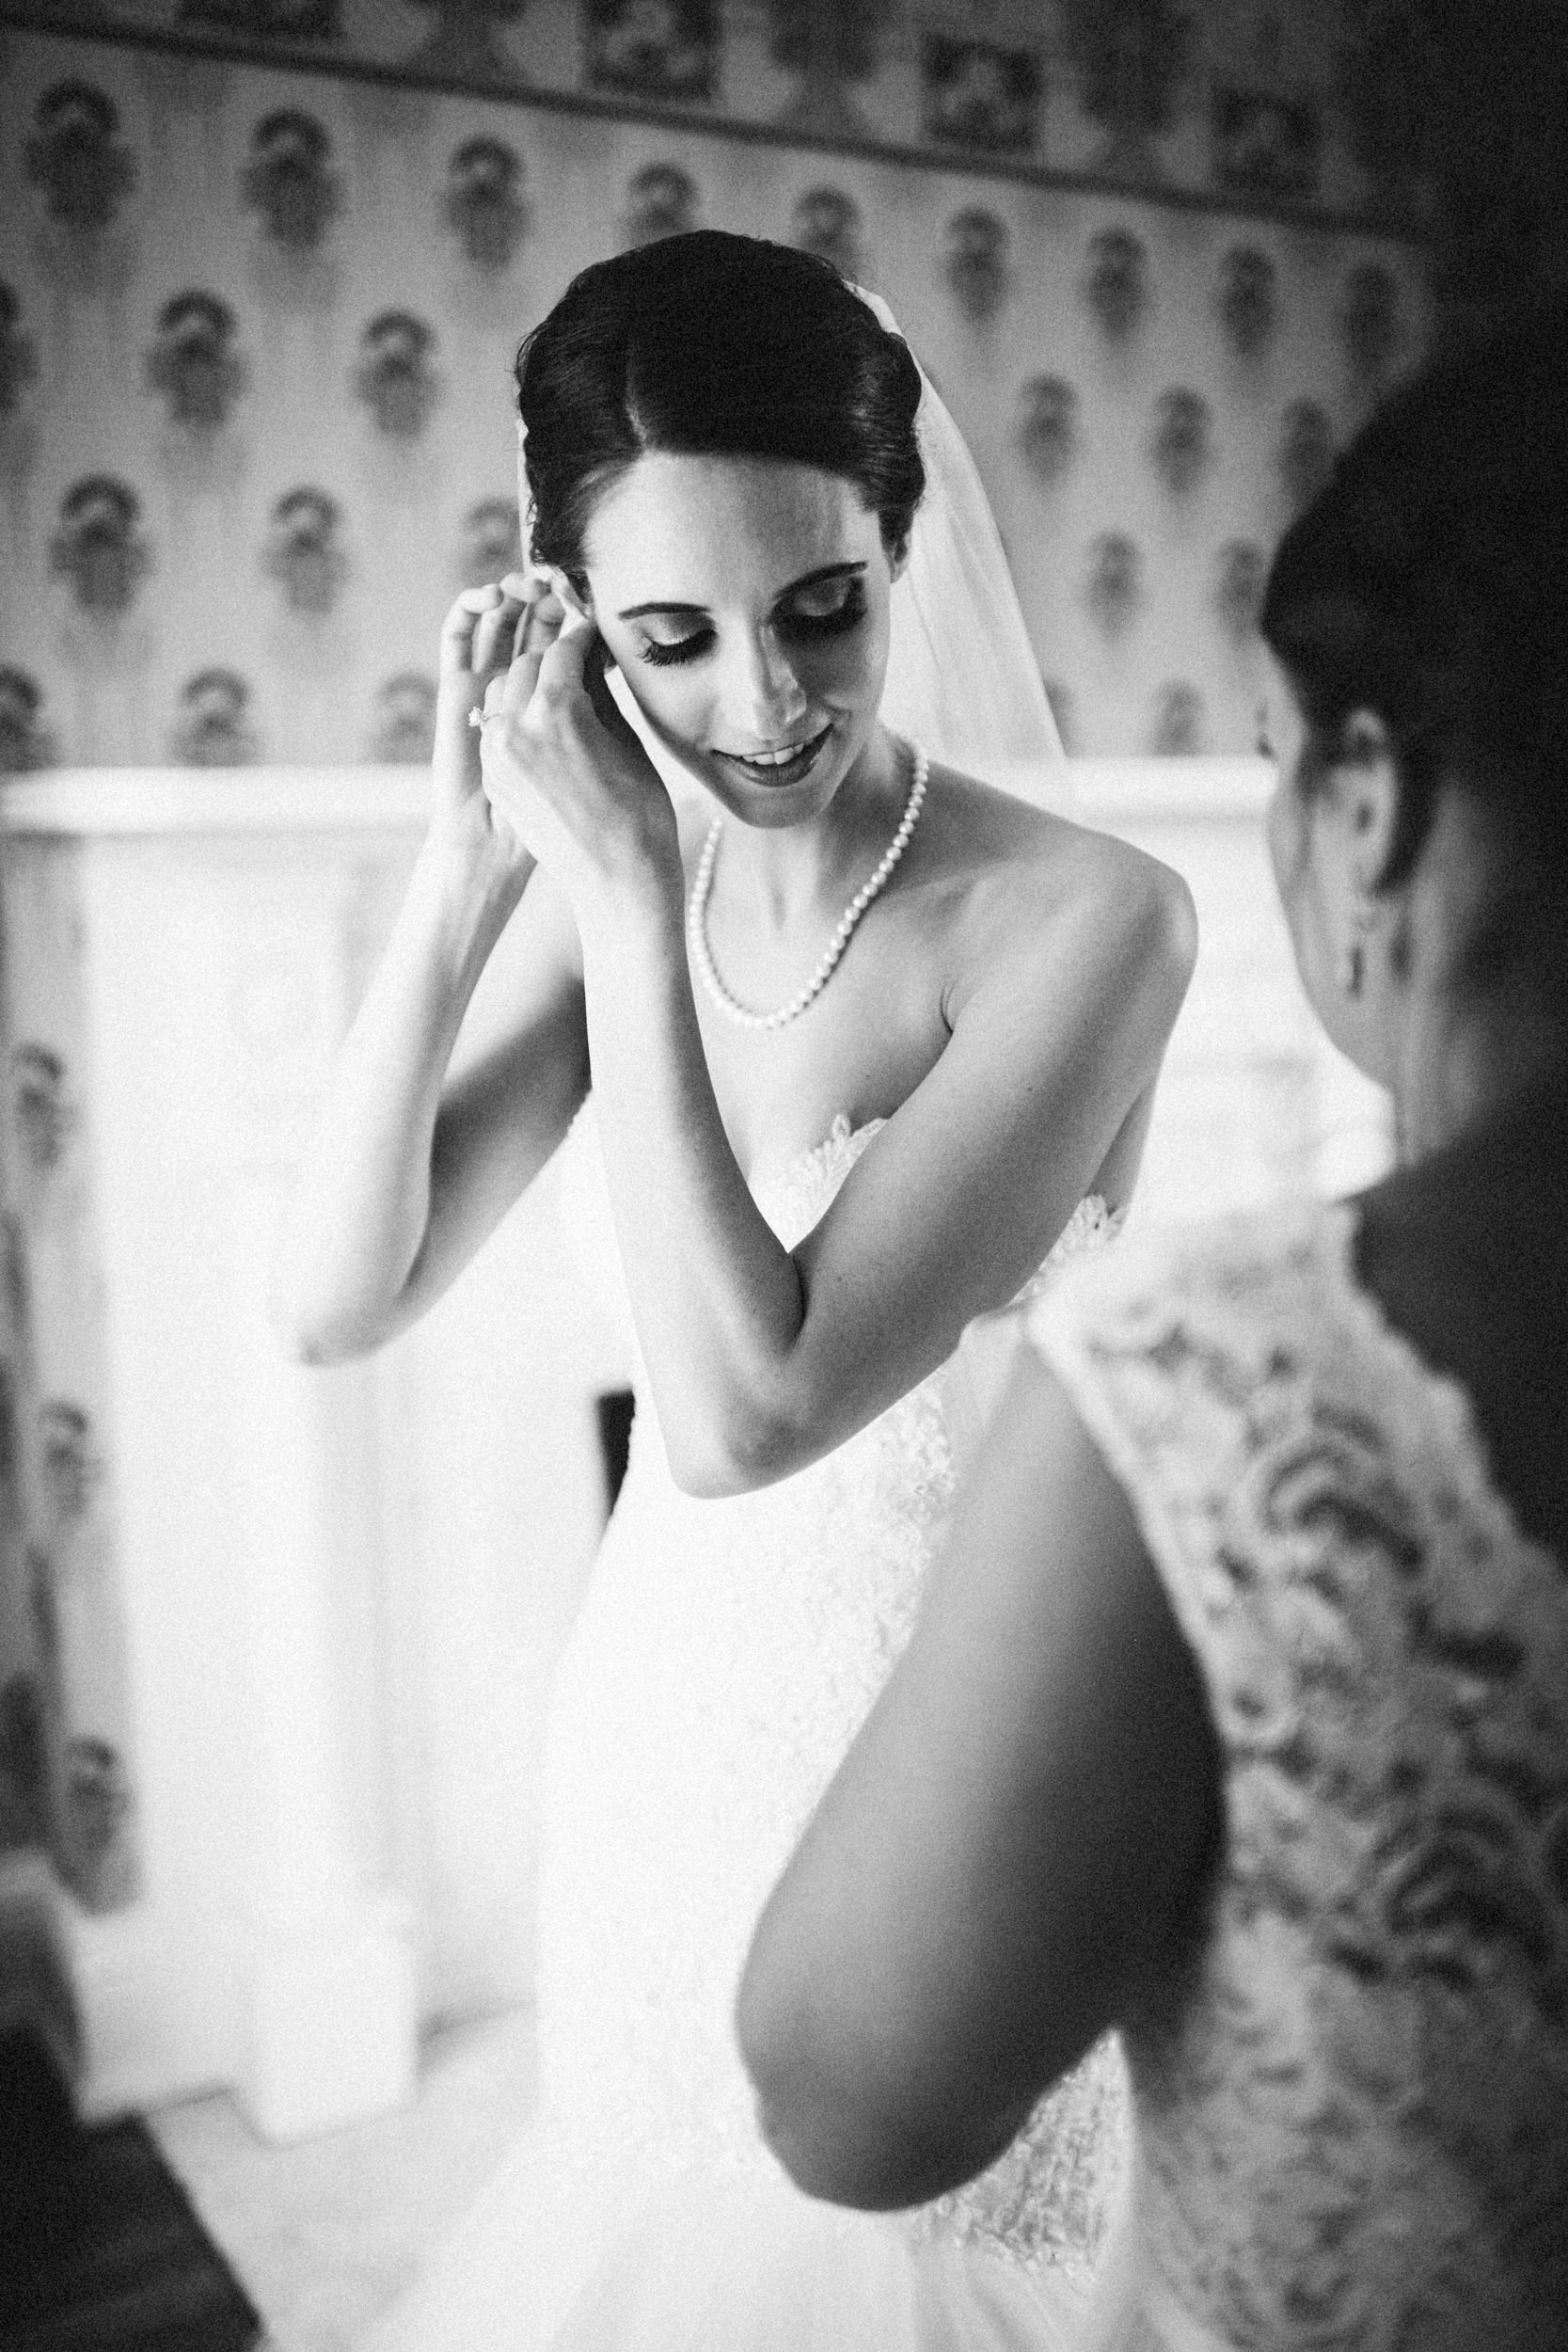 Louisville-Kentucky-Wedding-Elopement-Photographer-Sarah-Katherine-Davis-Photography-Whitehall-Classic-Timeless-Garden-Wedding-161.jpg